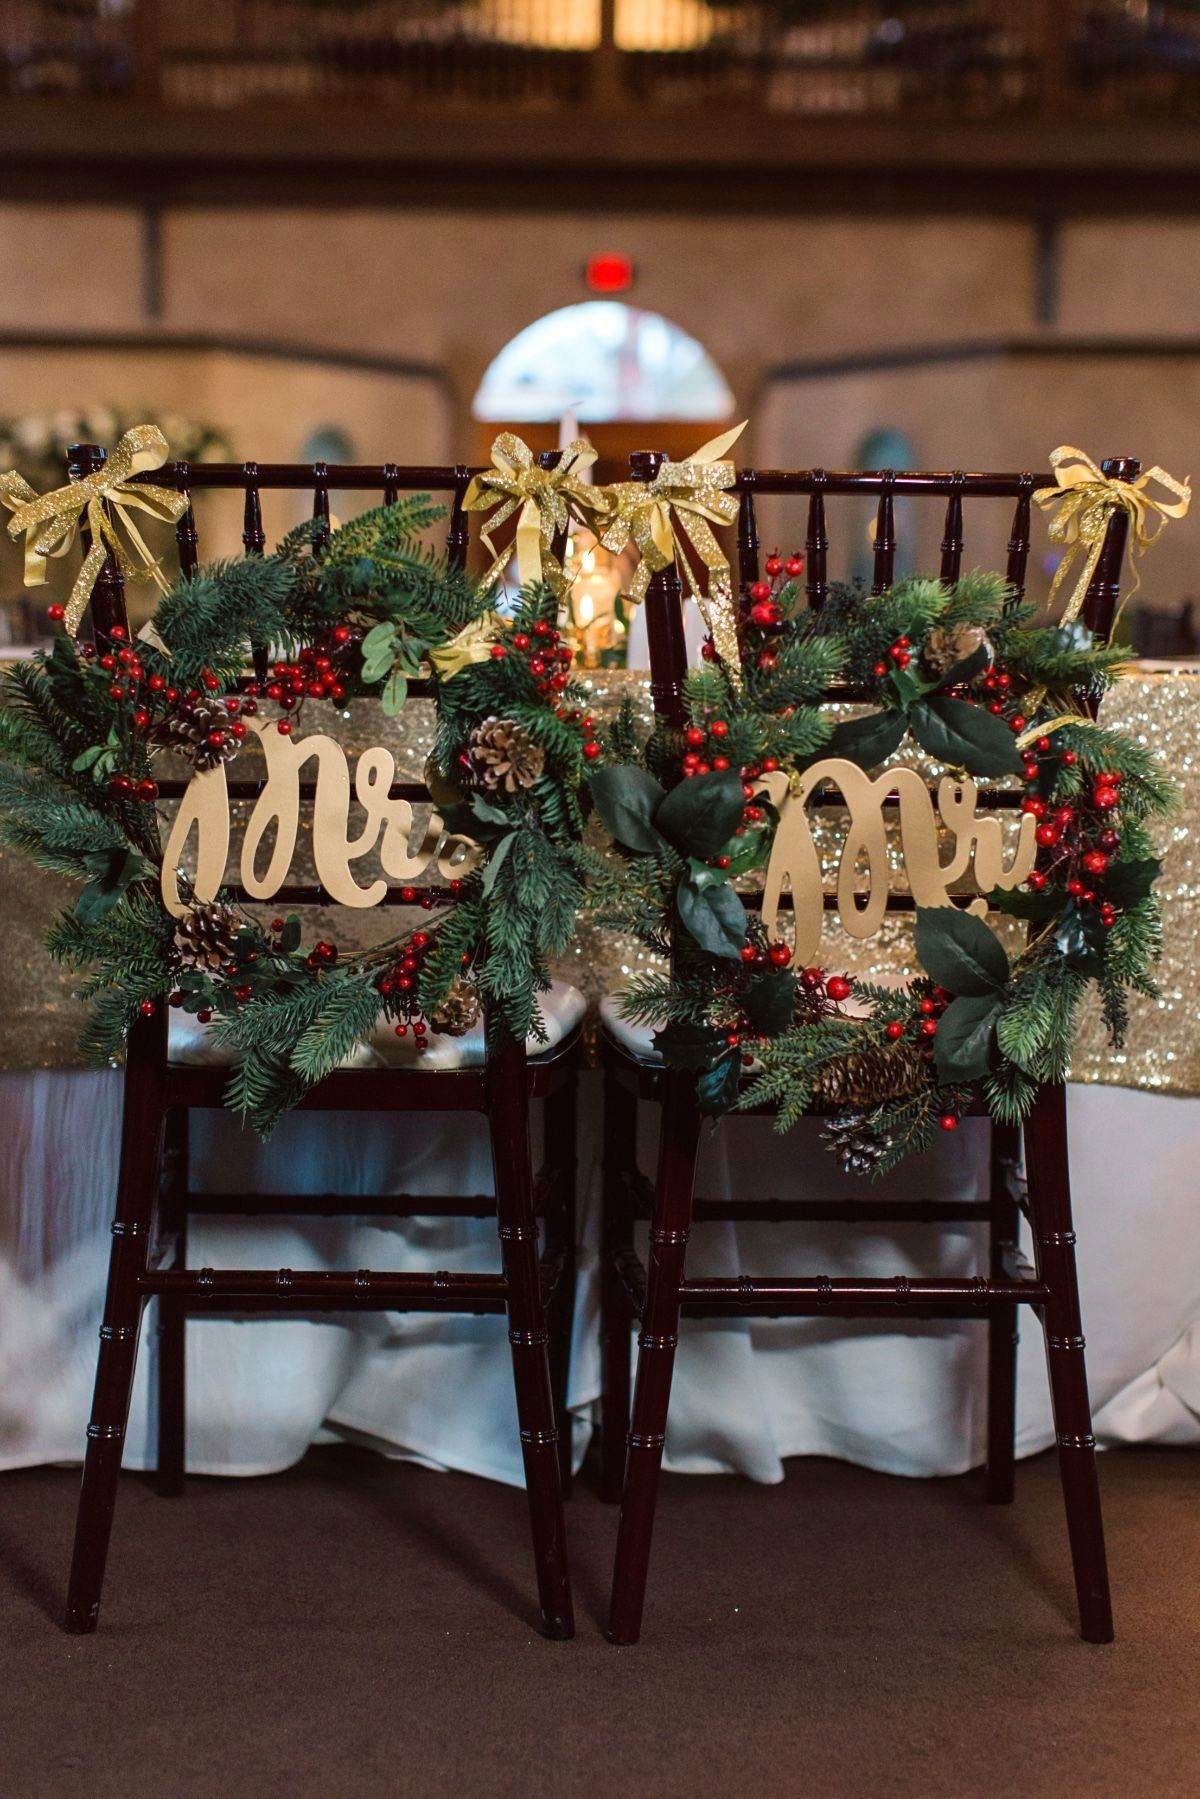 Mr & Mrs Wedding seats with Christmas wreaths